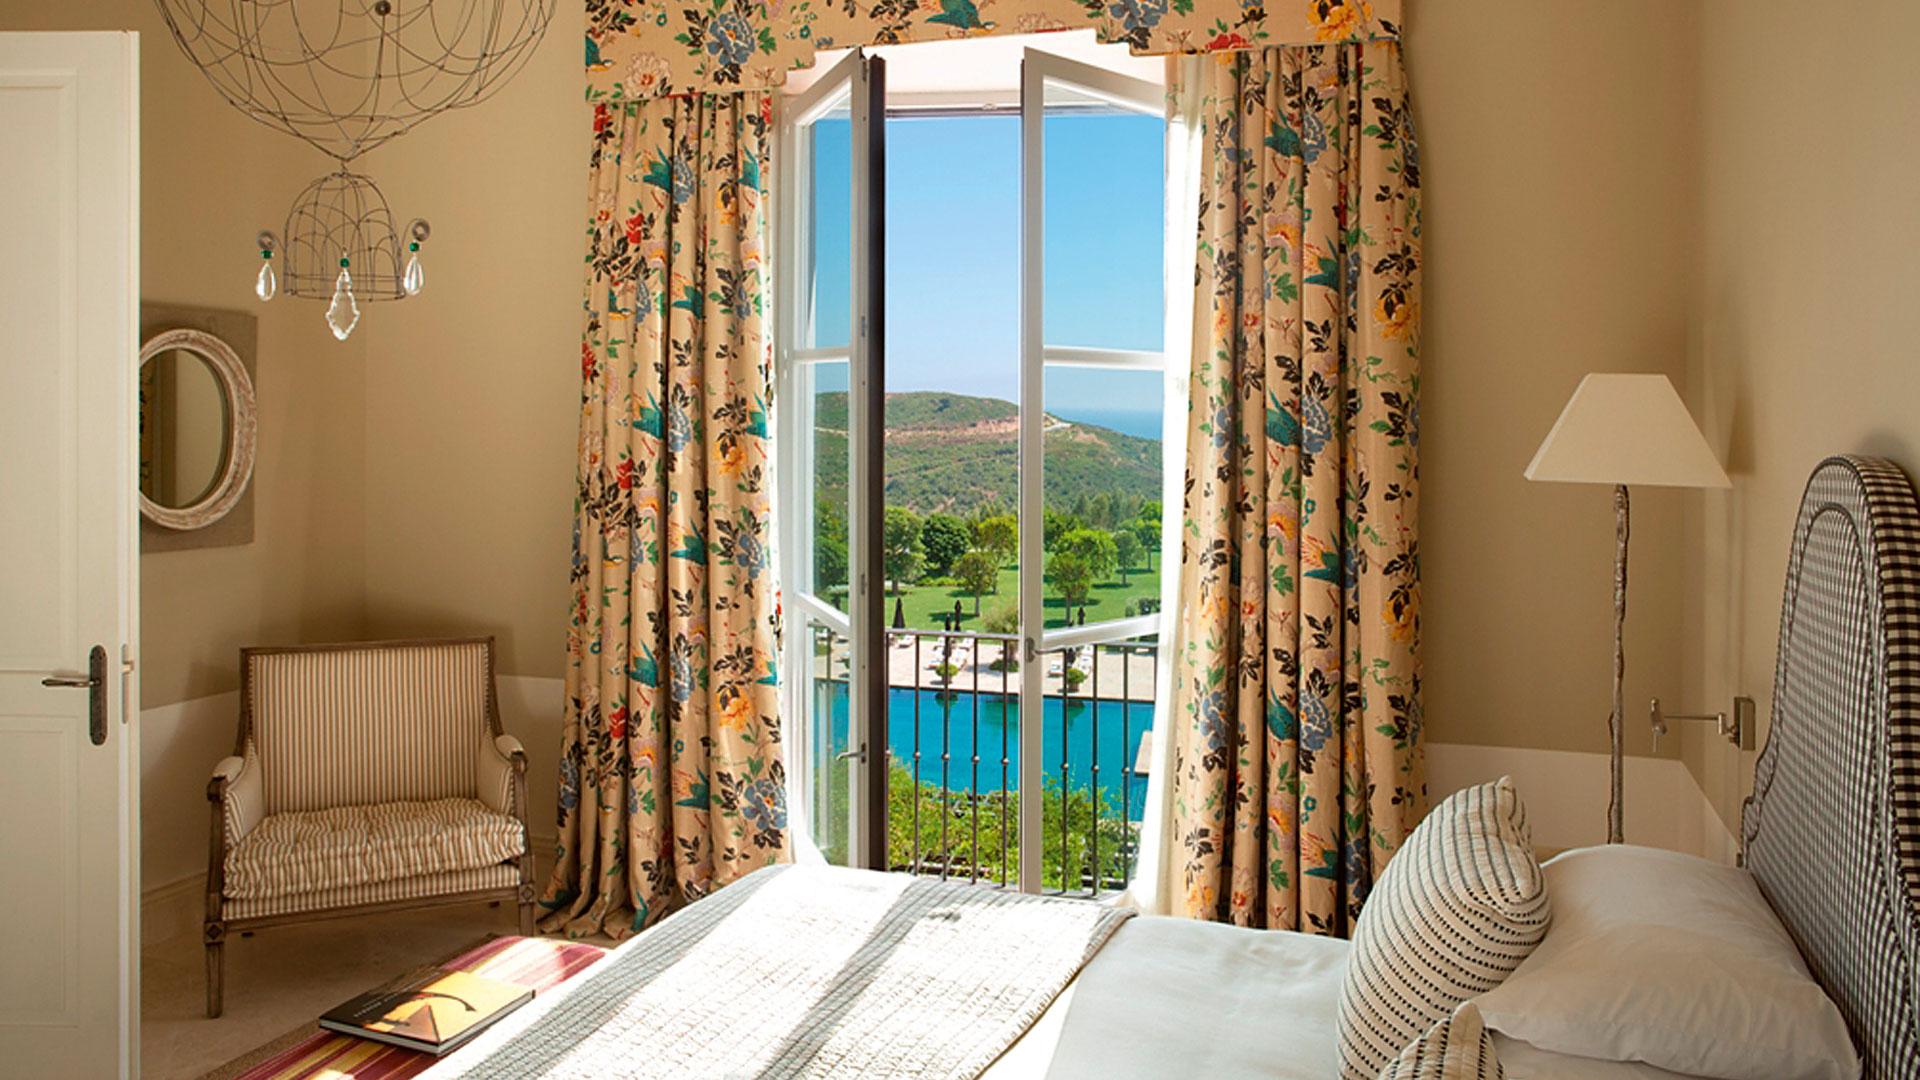 Hideaways hotels · finca cortesin hotel golf & spa casares